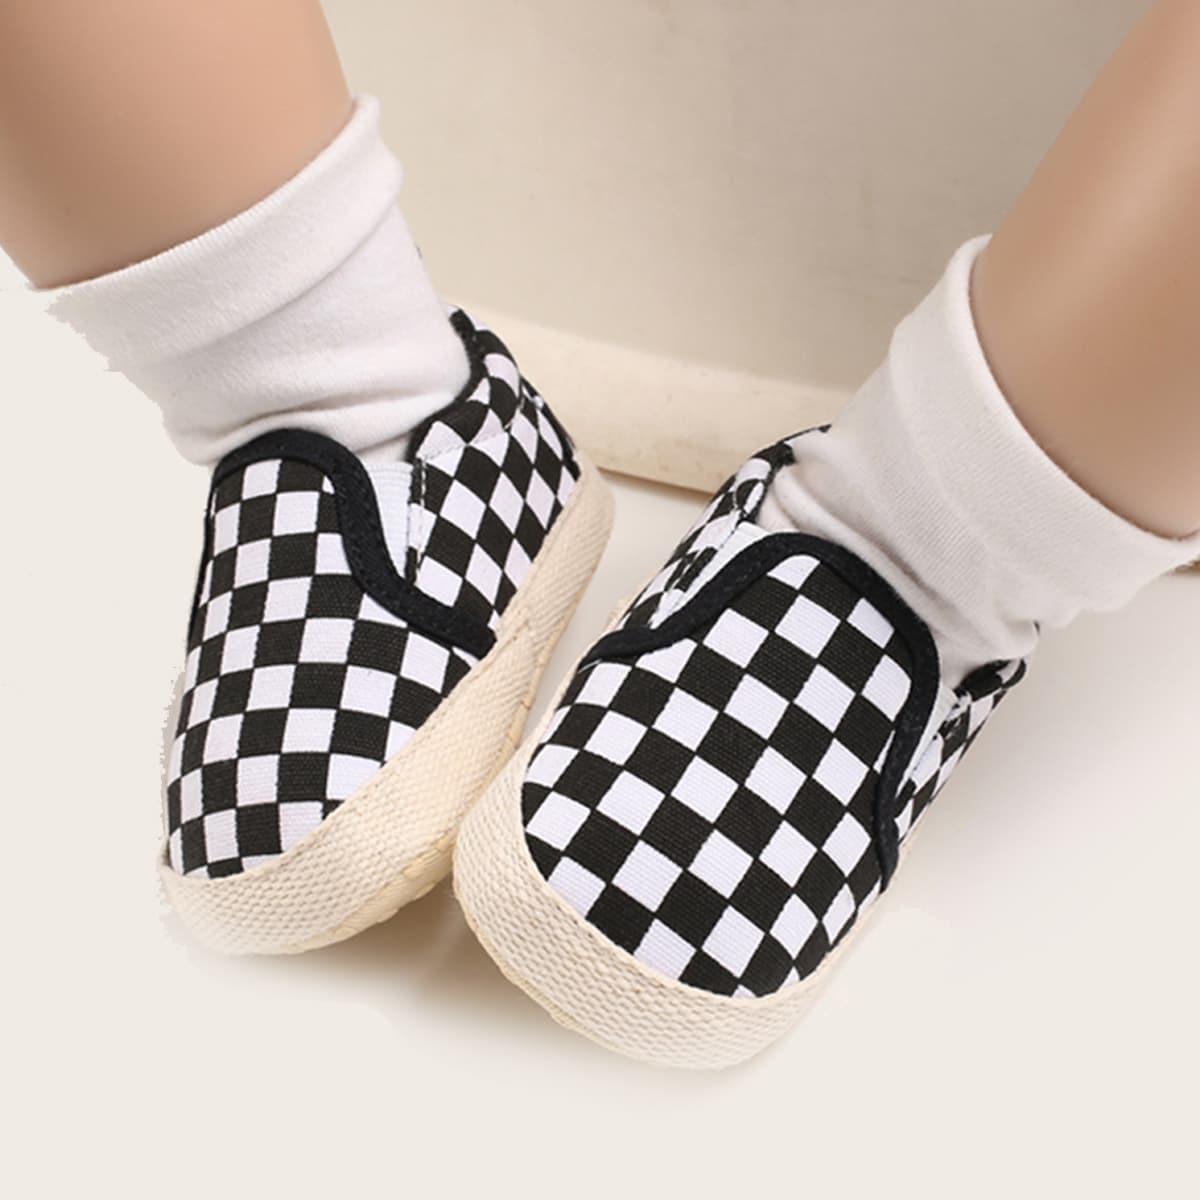 shein Gevlochten Baby platte schoentjes